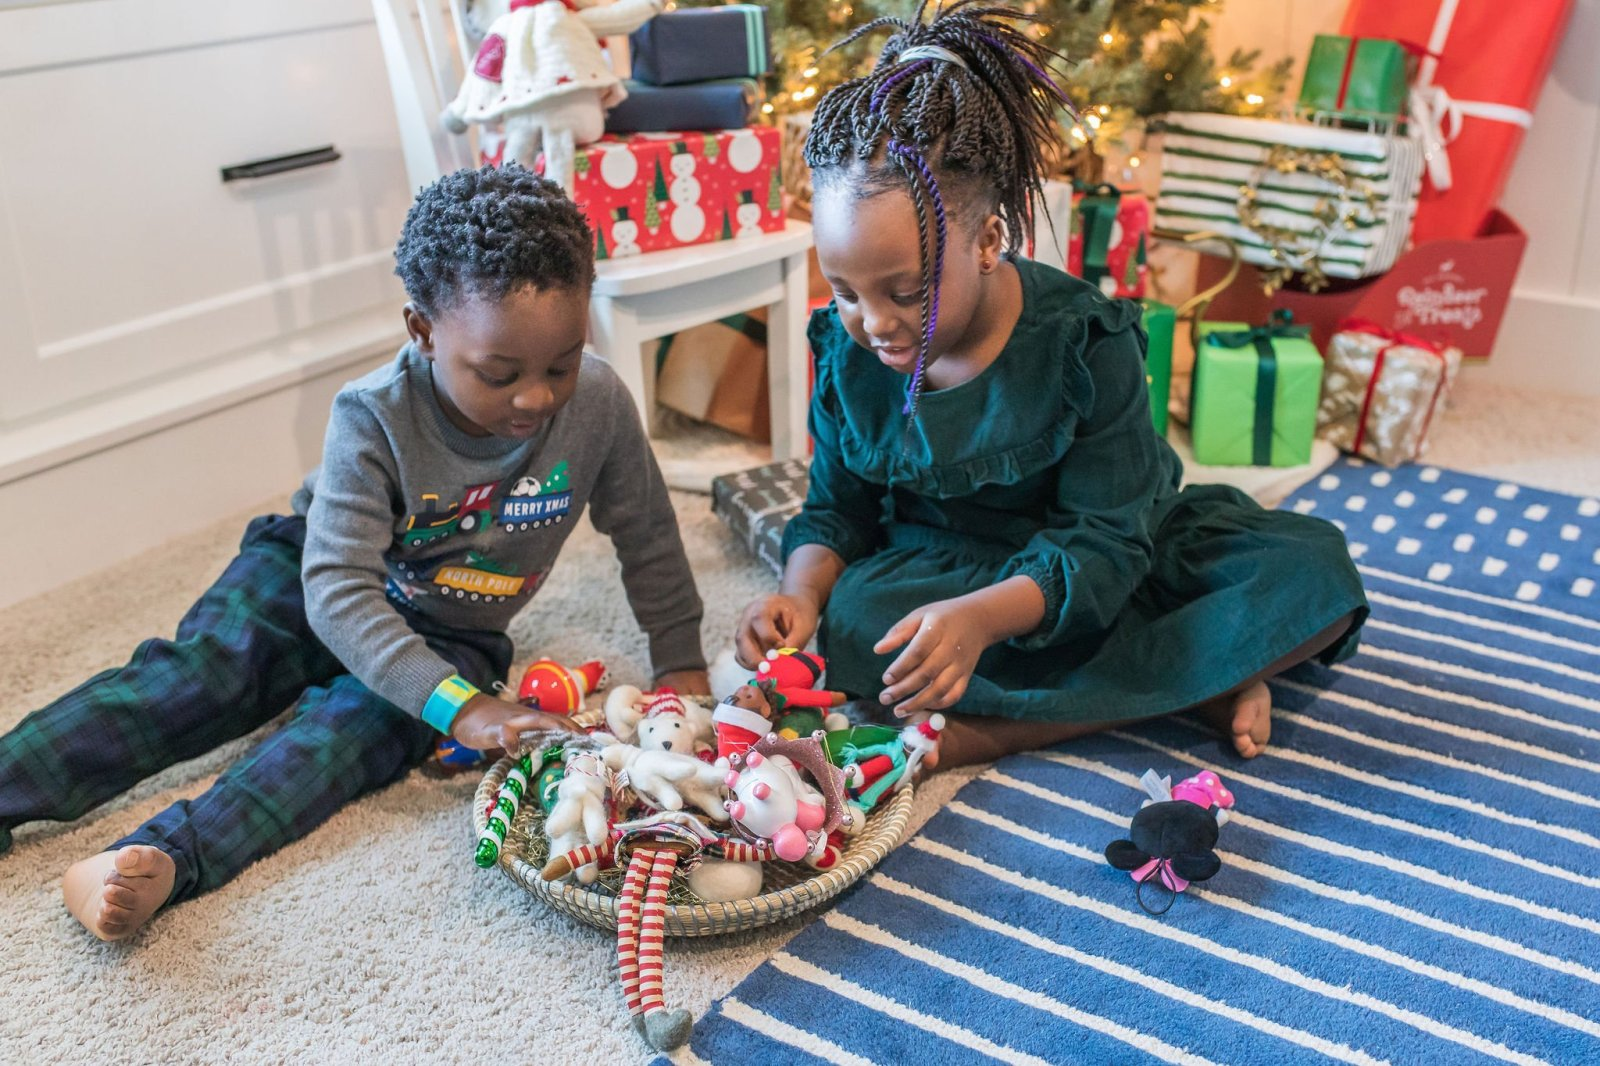 kids-friendly Christmas ornaments; felt ornaments, shatterproof ornaments,  plastic ornaments.